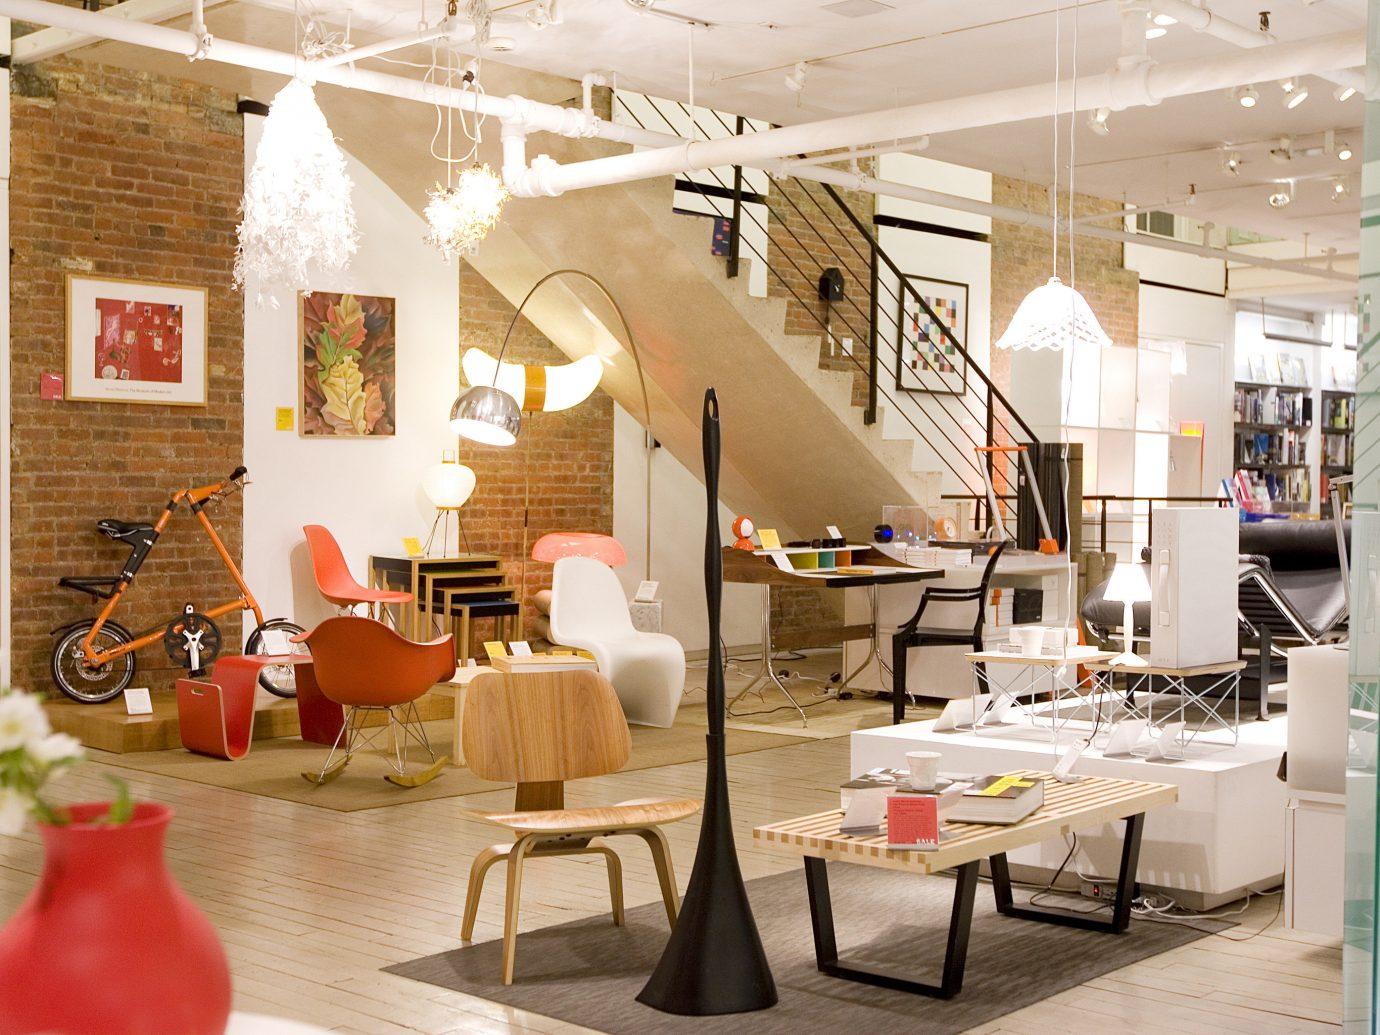 NYC Shops Style + Design indoor floor room Living interior design furniture loft living room table interior designer café ceiling area